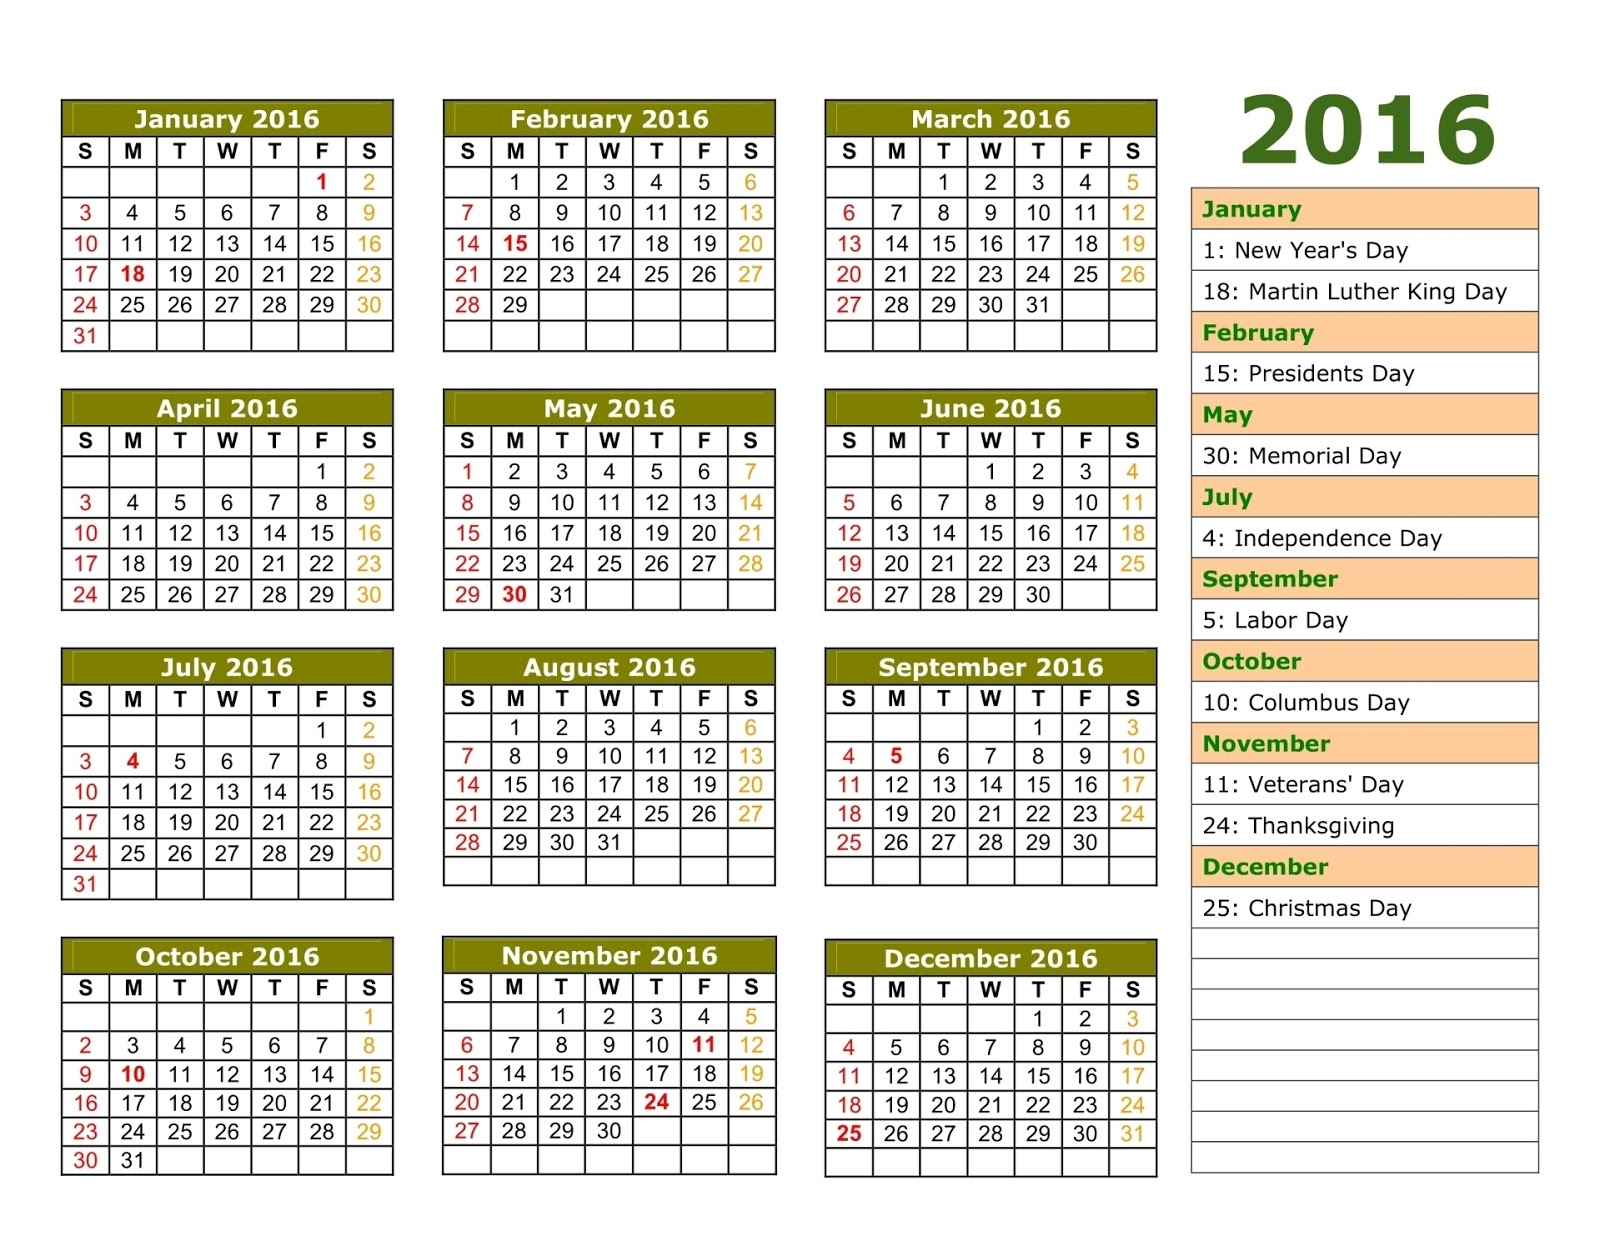 Free]^ Printable Calendar 2016: Printable 2016 Calendar with US ...